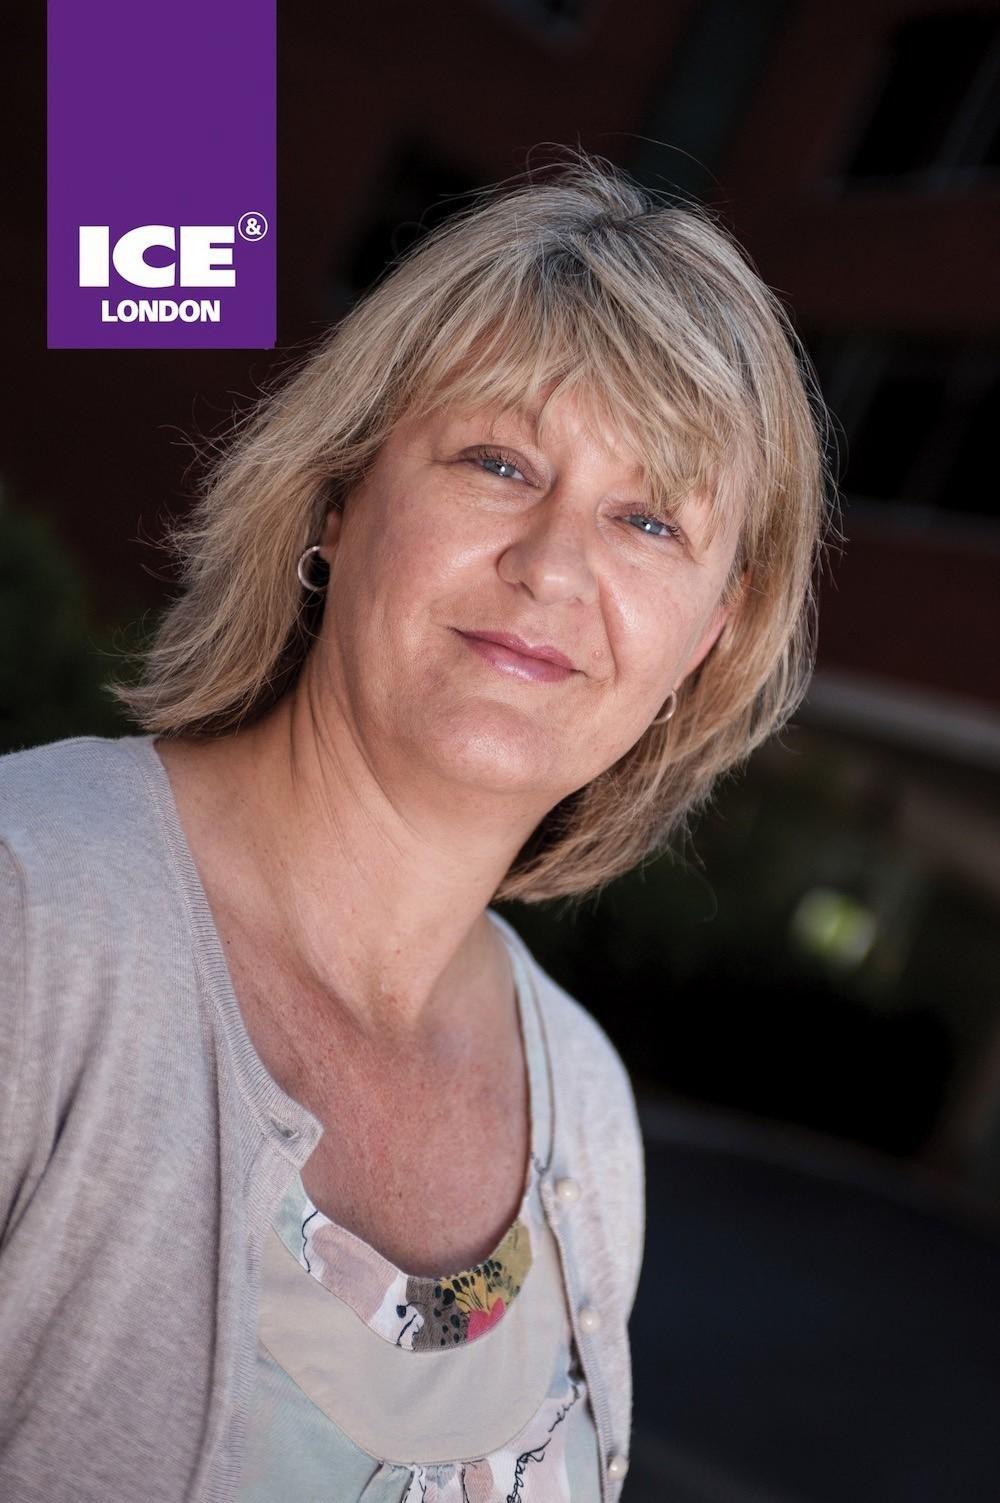 ICE London breaks through landmark figure of 600 exhibitors